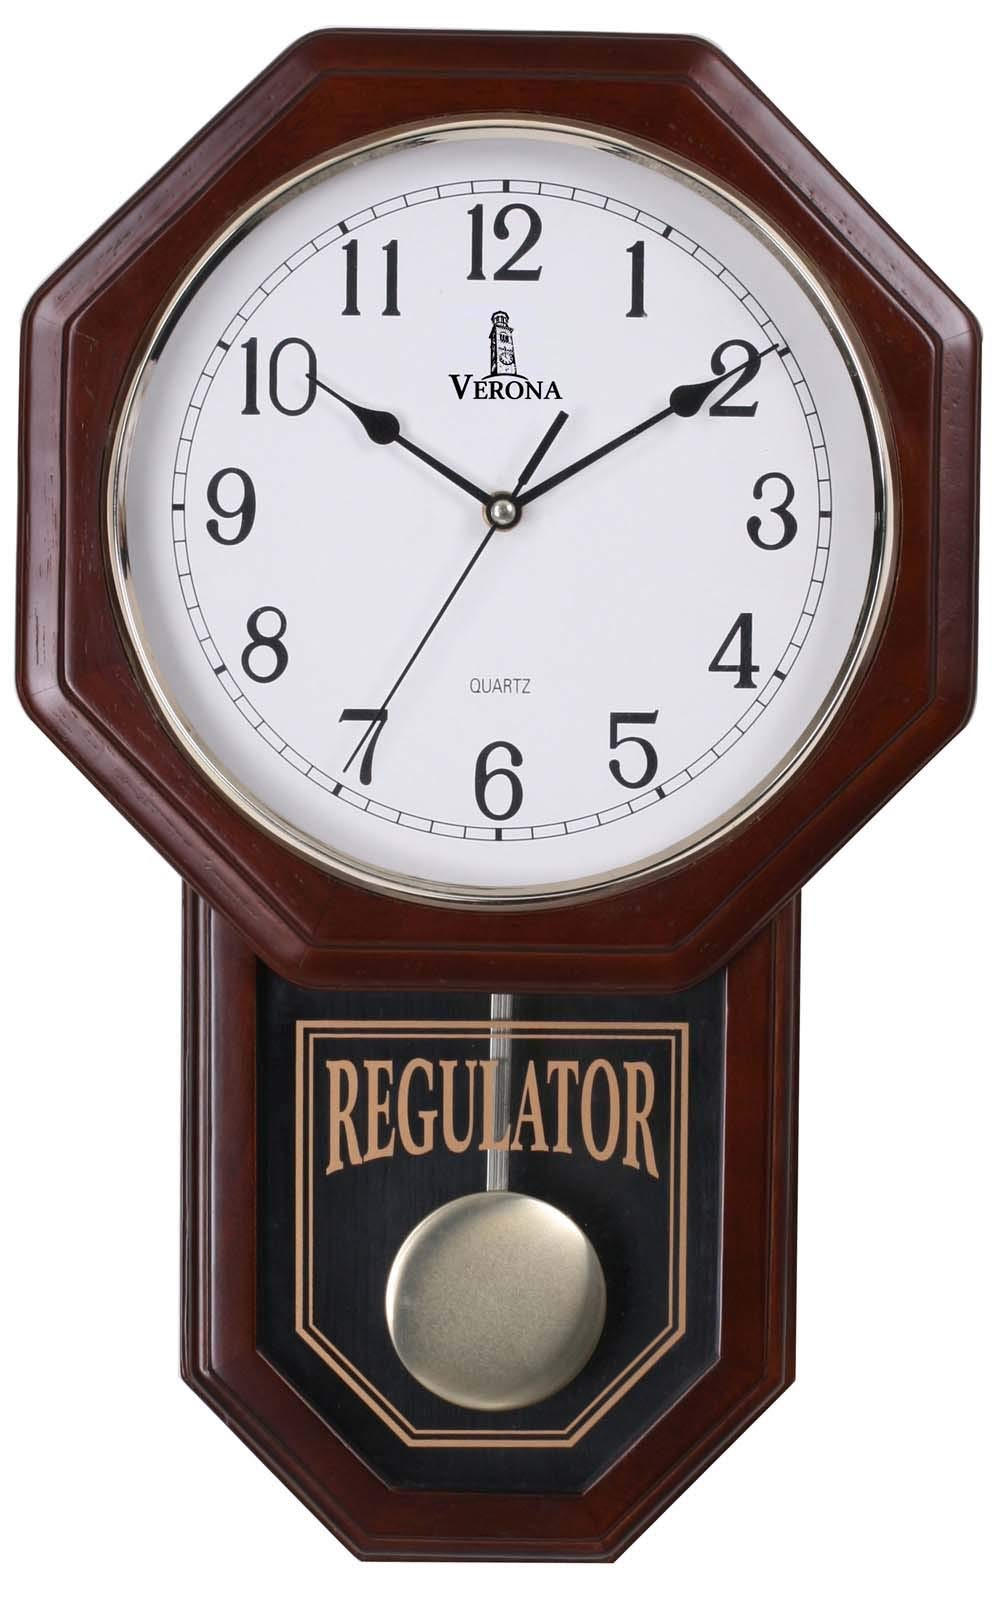 Pendulum Wall Clock Battery Operated - Quartz Wood Pendulum Clock - Silent, Wooden Schoolhouse Regulator Design, Decorative Wall Clock Pendulum, for Living Room, Kitchen & Home Décor, 18'' x 11.25'' by Lovely Home Essentials